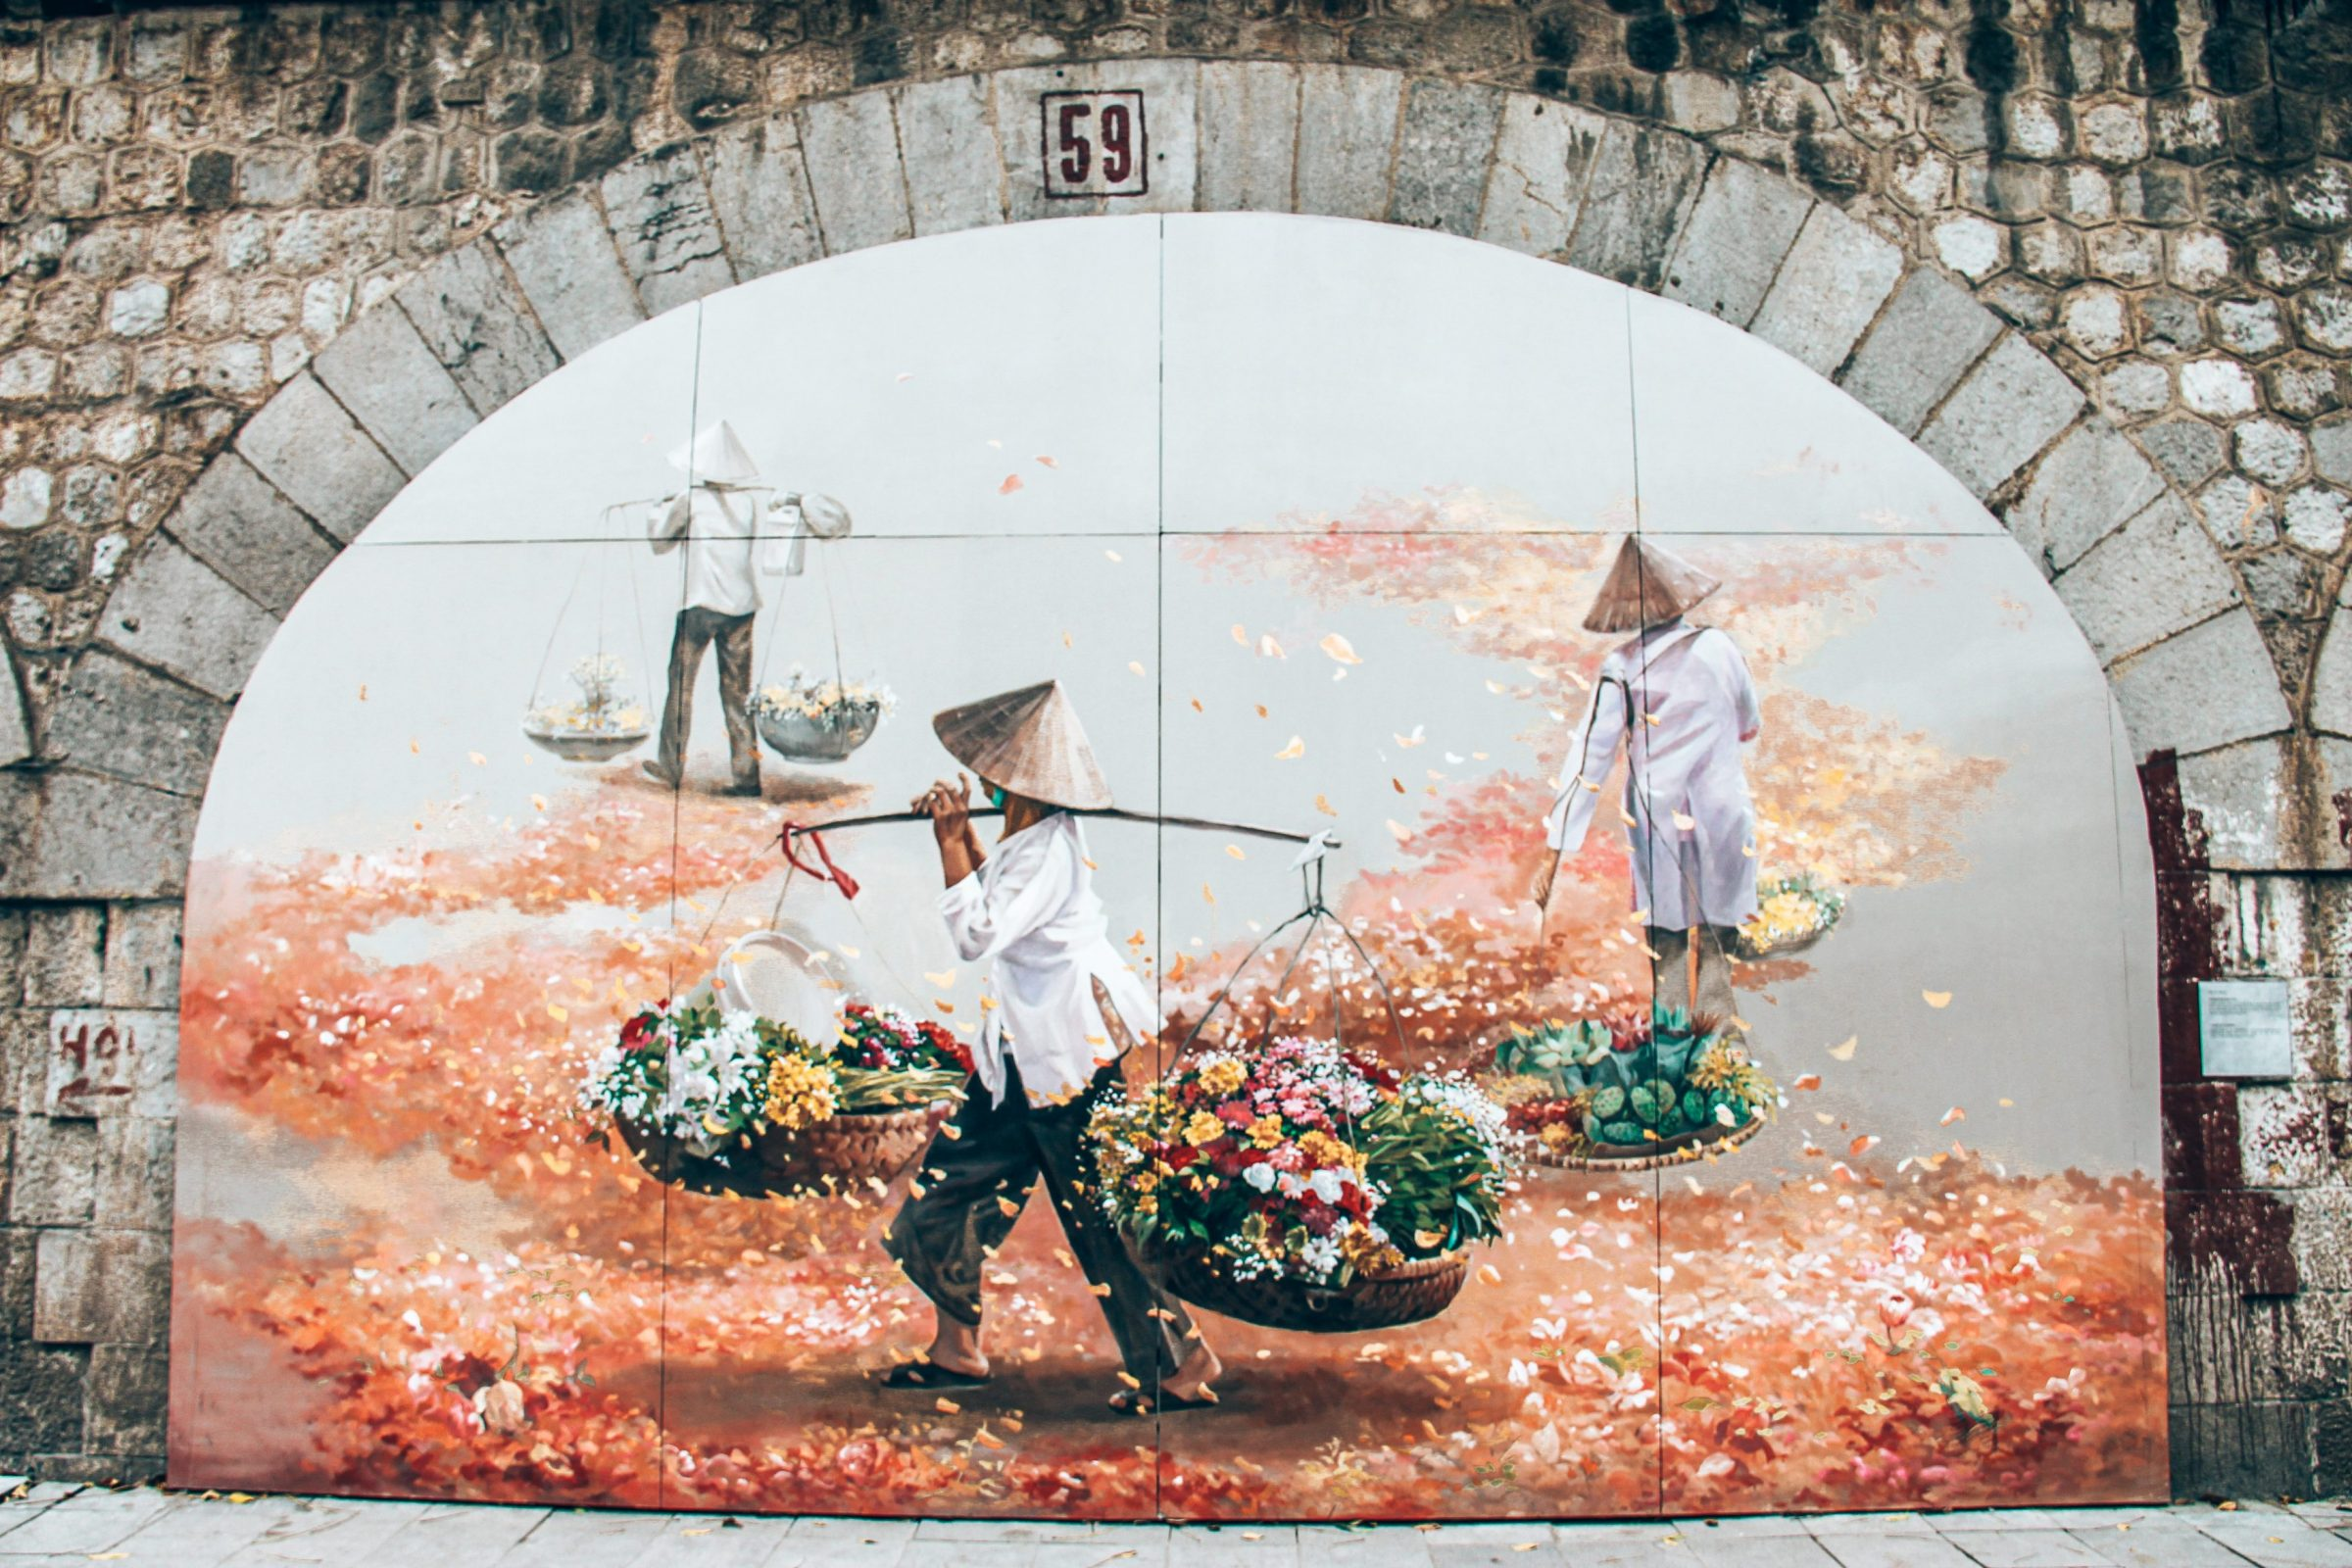 Streetart in Hanoi - Prachtige schilderingen